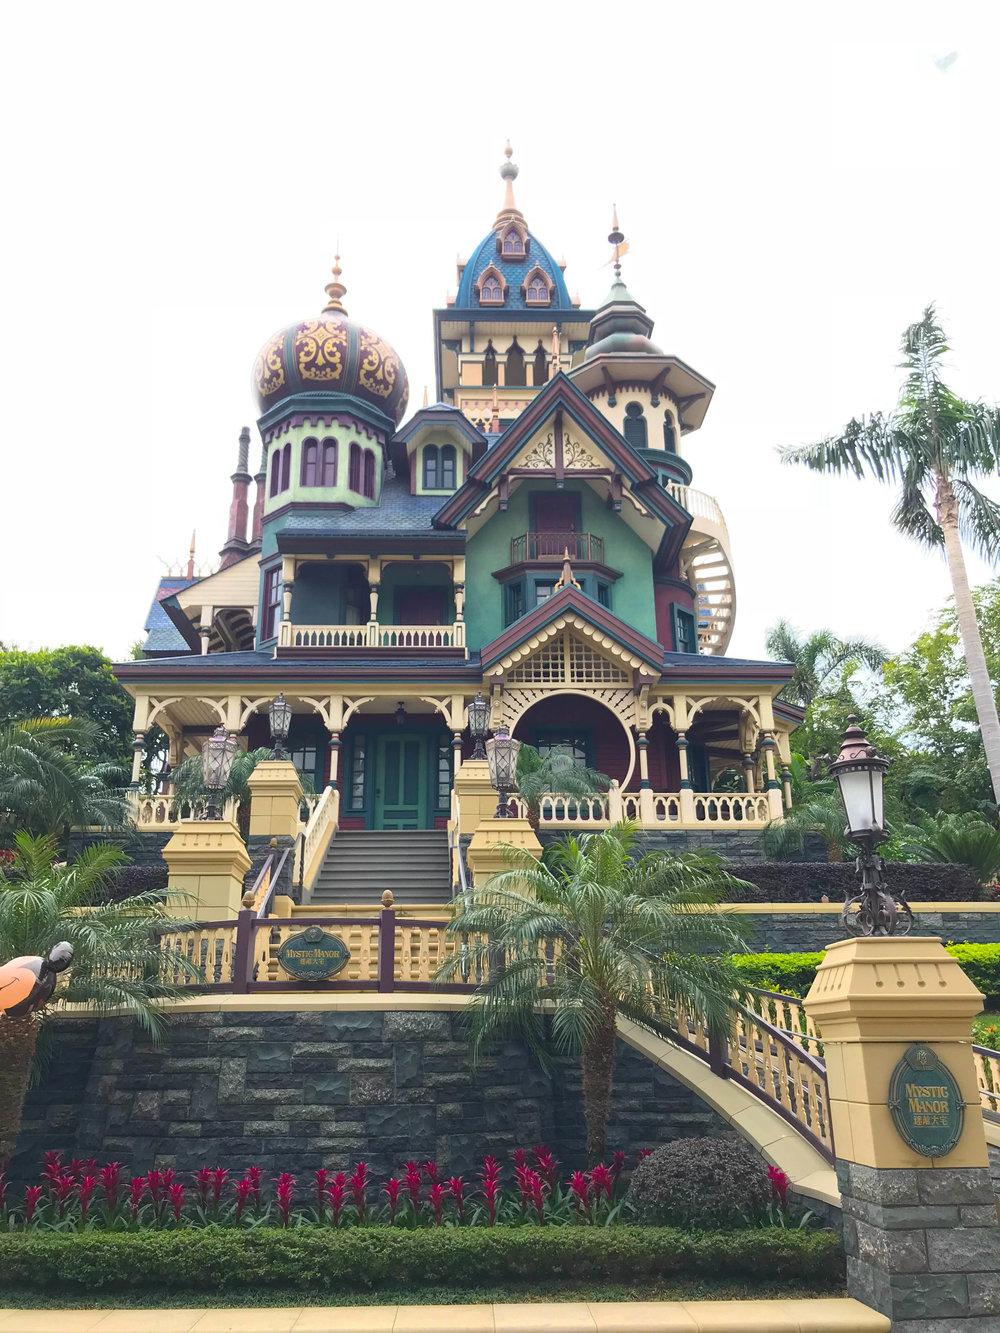 Hong-Kong-Disneyland-mystic-Manor.jpg